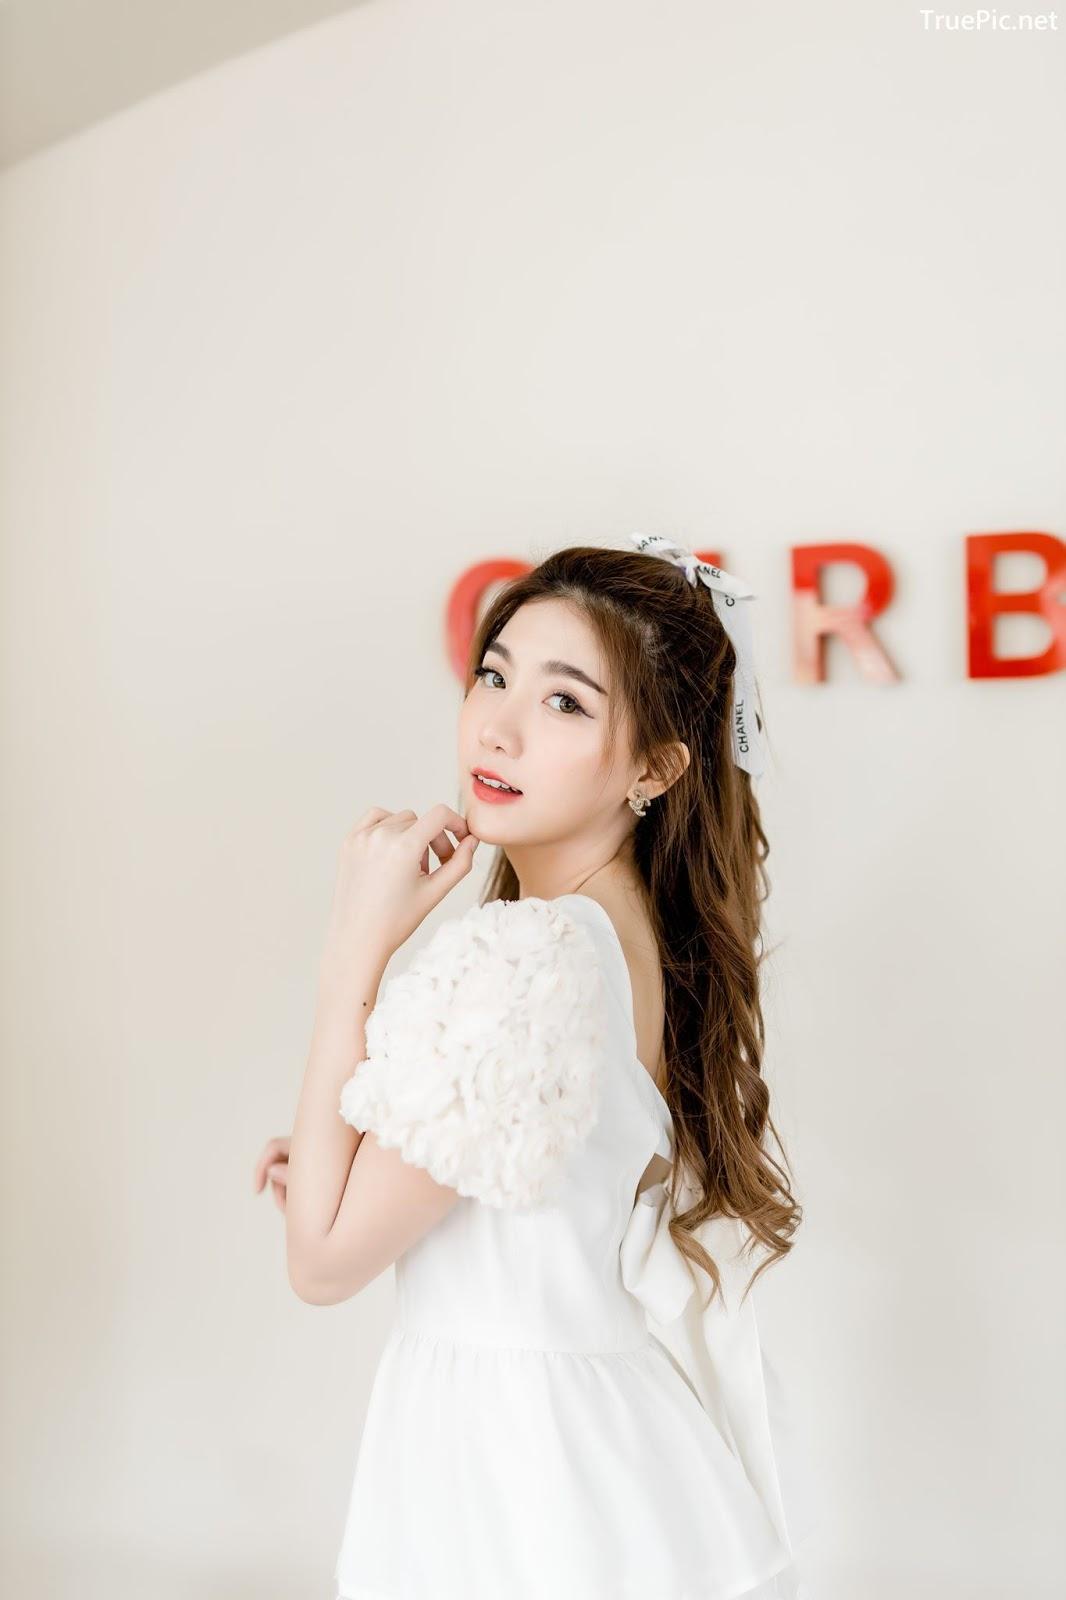 Image Thailand Model - Sasi Ngiunwan - Barbie Doll Smile - TruePic.net - Picture-3